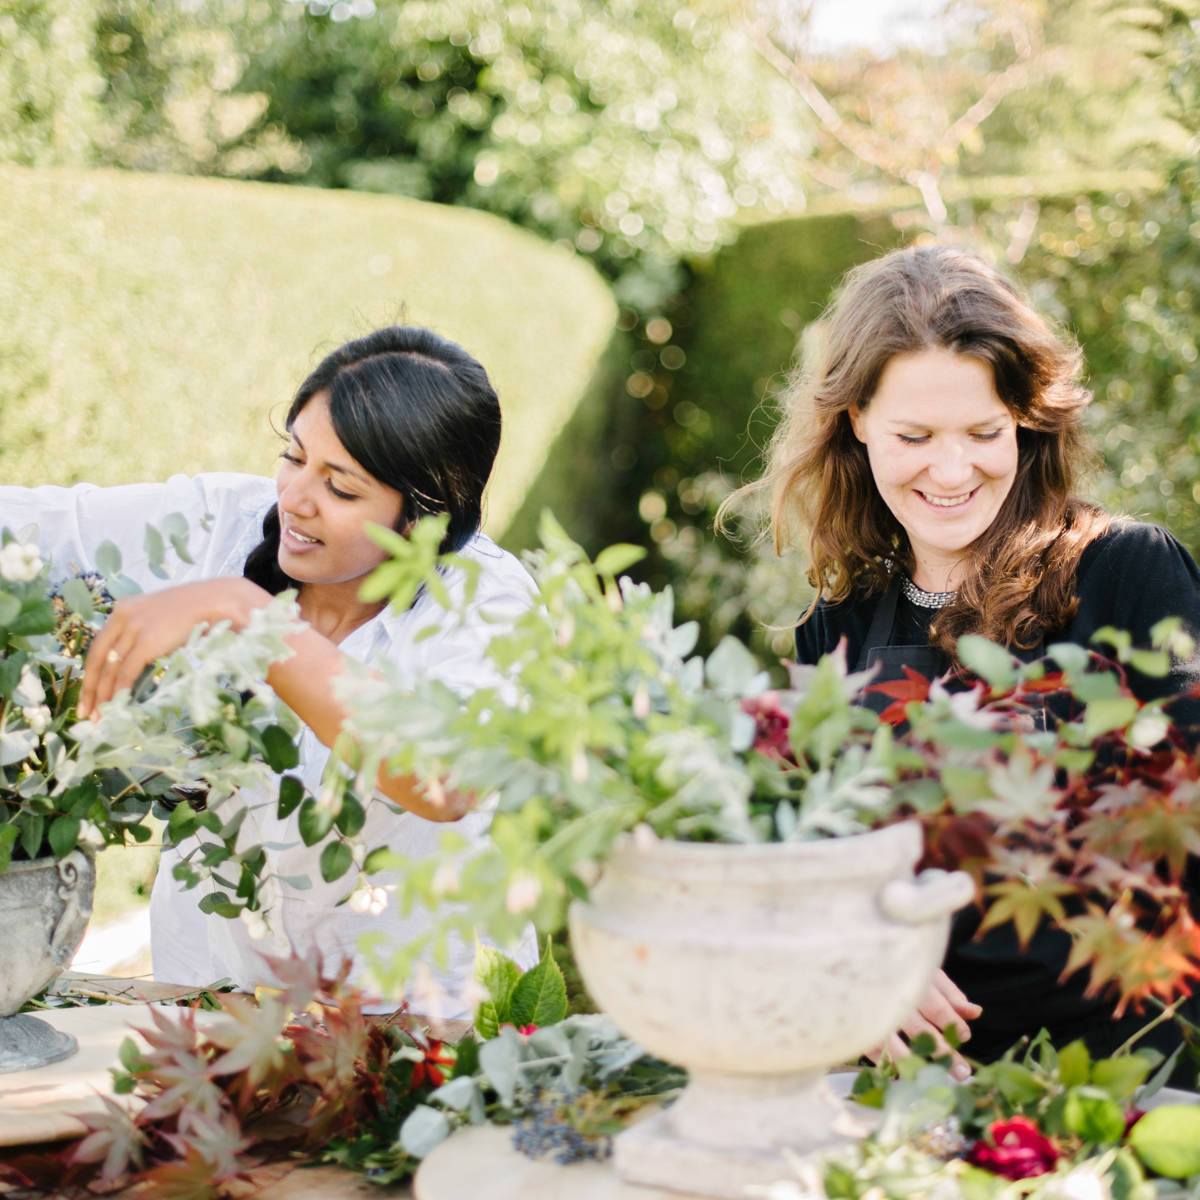 Career profile: Sarah from Floribunda Rose, artisan wedding florist